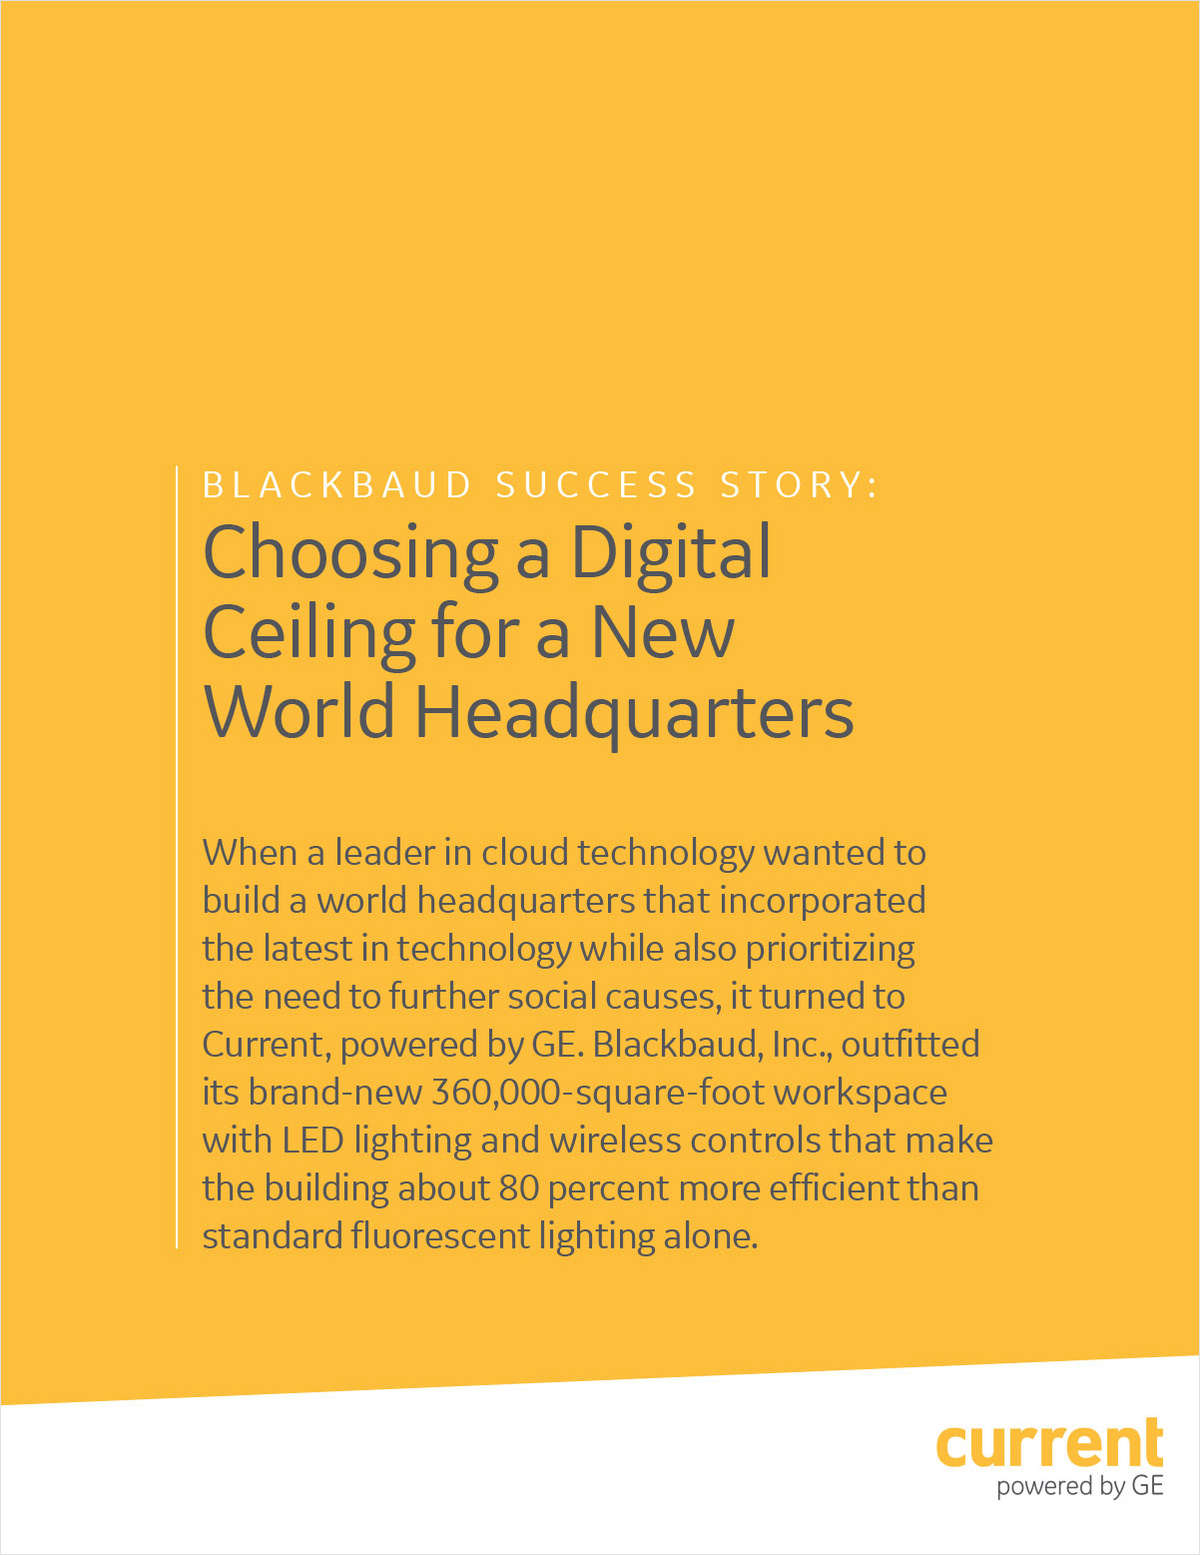 Blackbaud Success Story